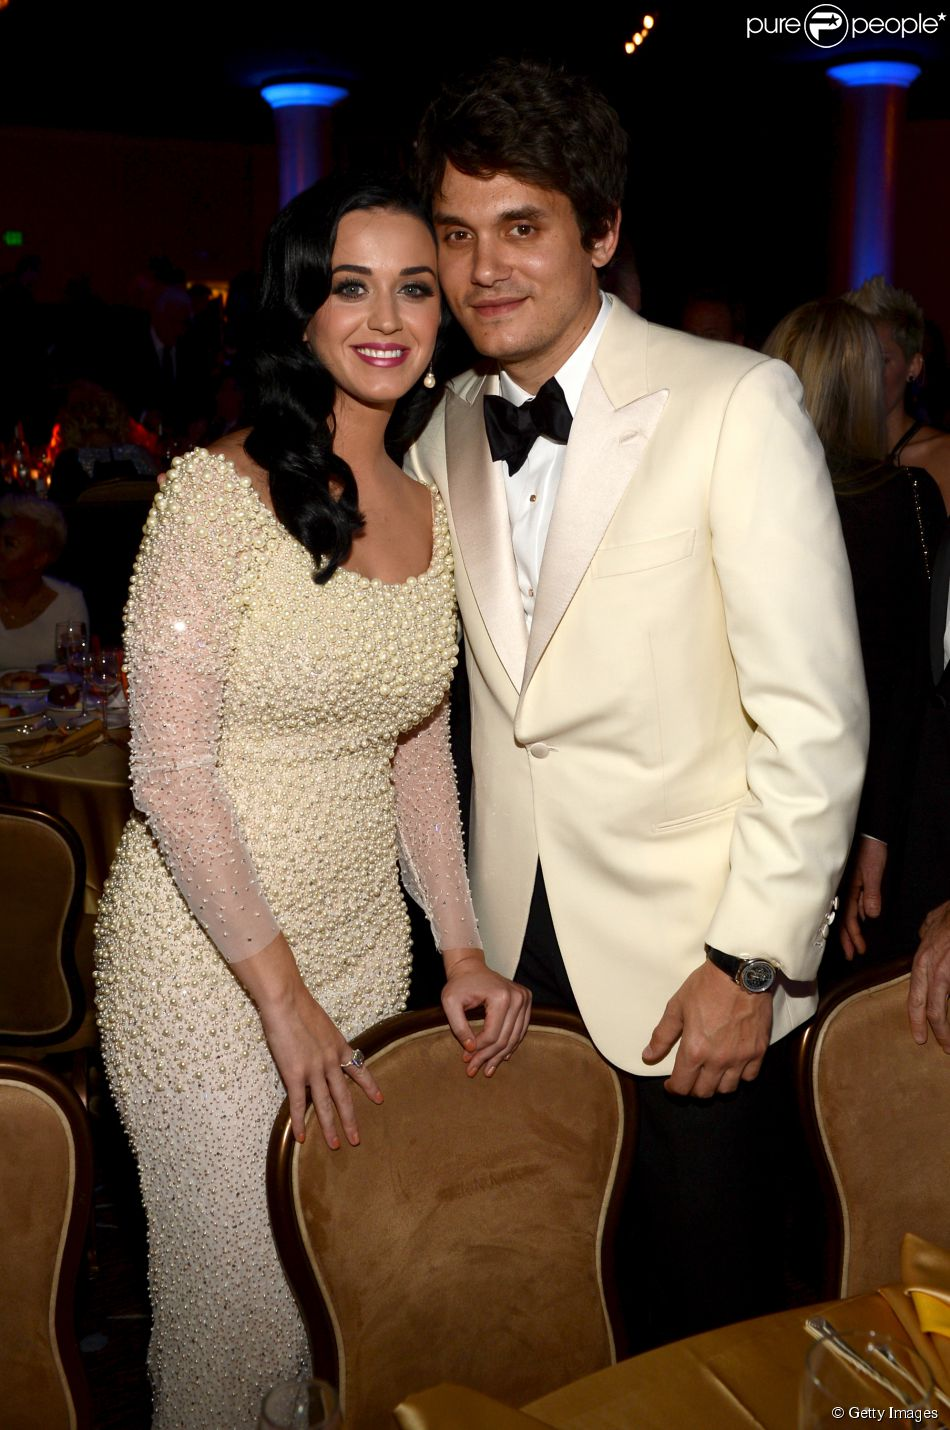 Katy Perry termina namoro novamente com John Mayer, segundo site americano